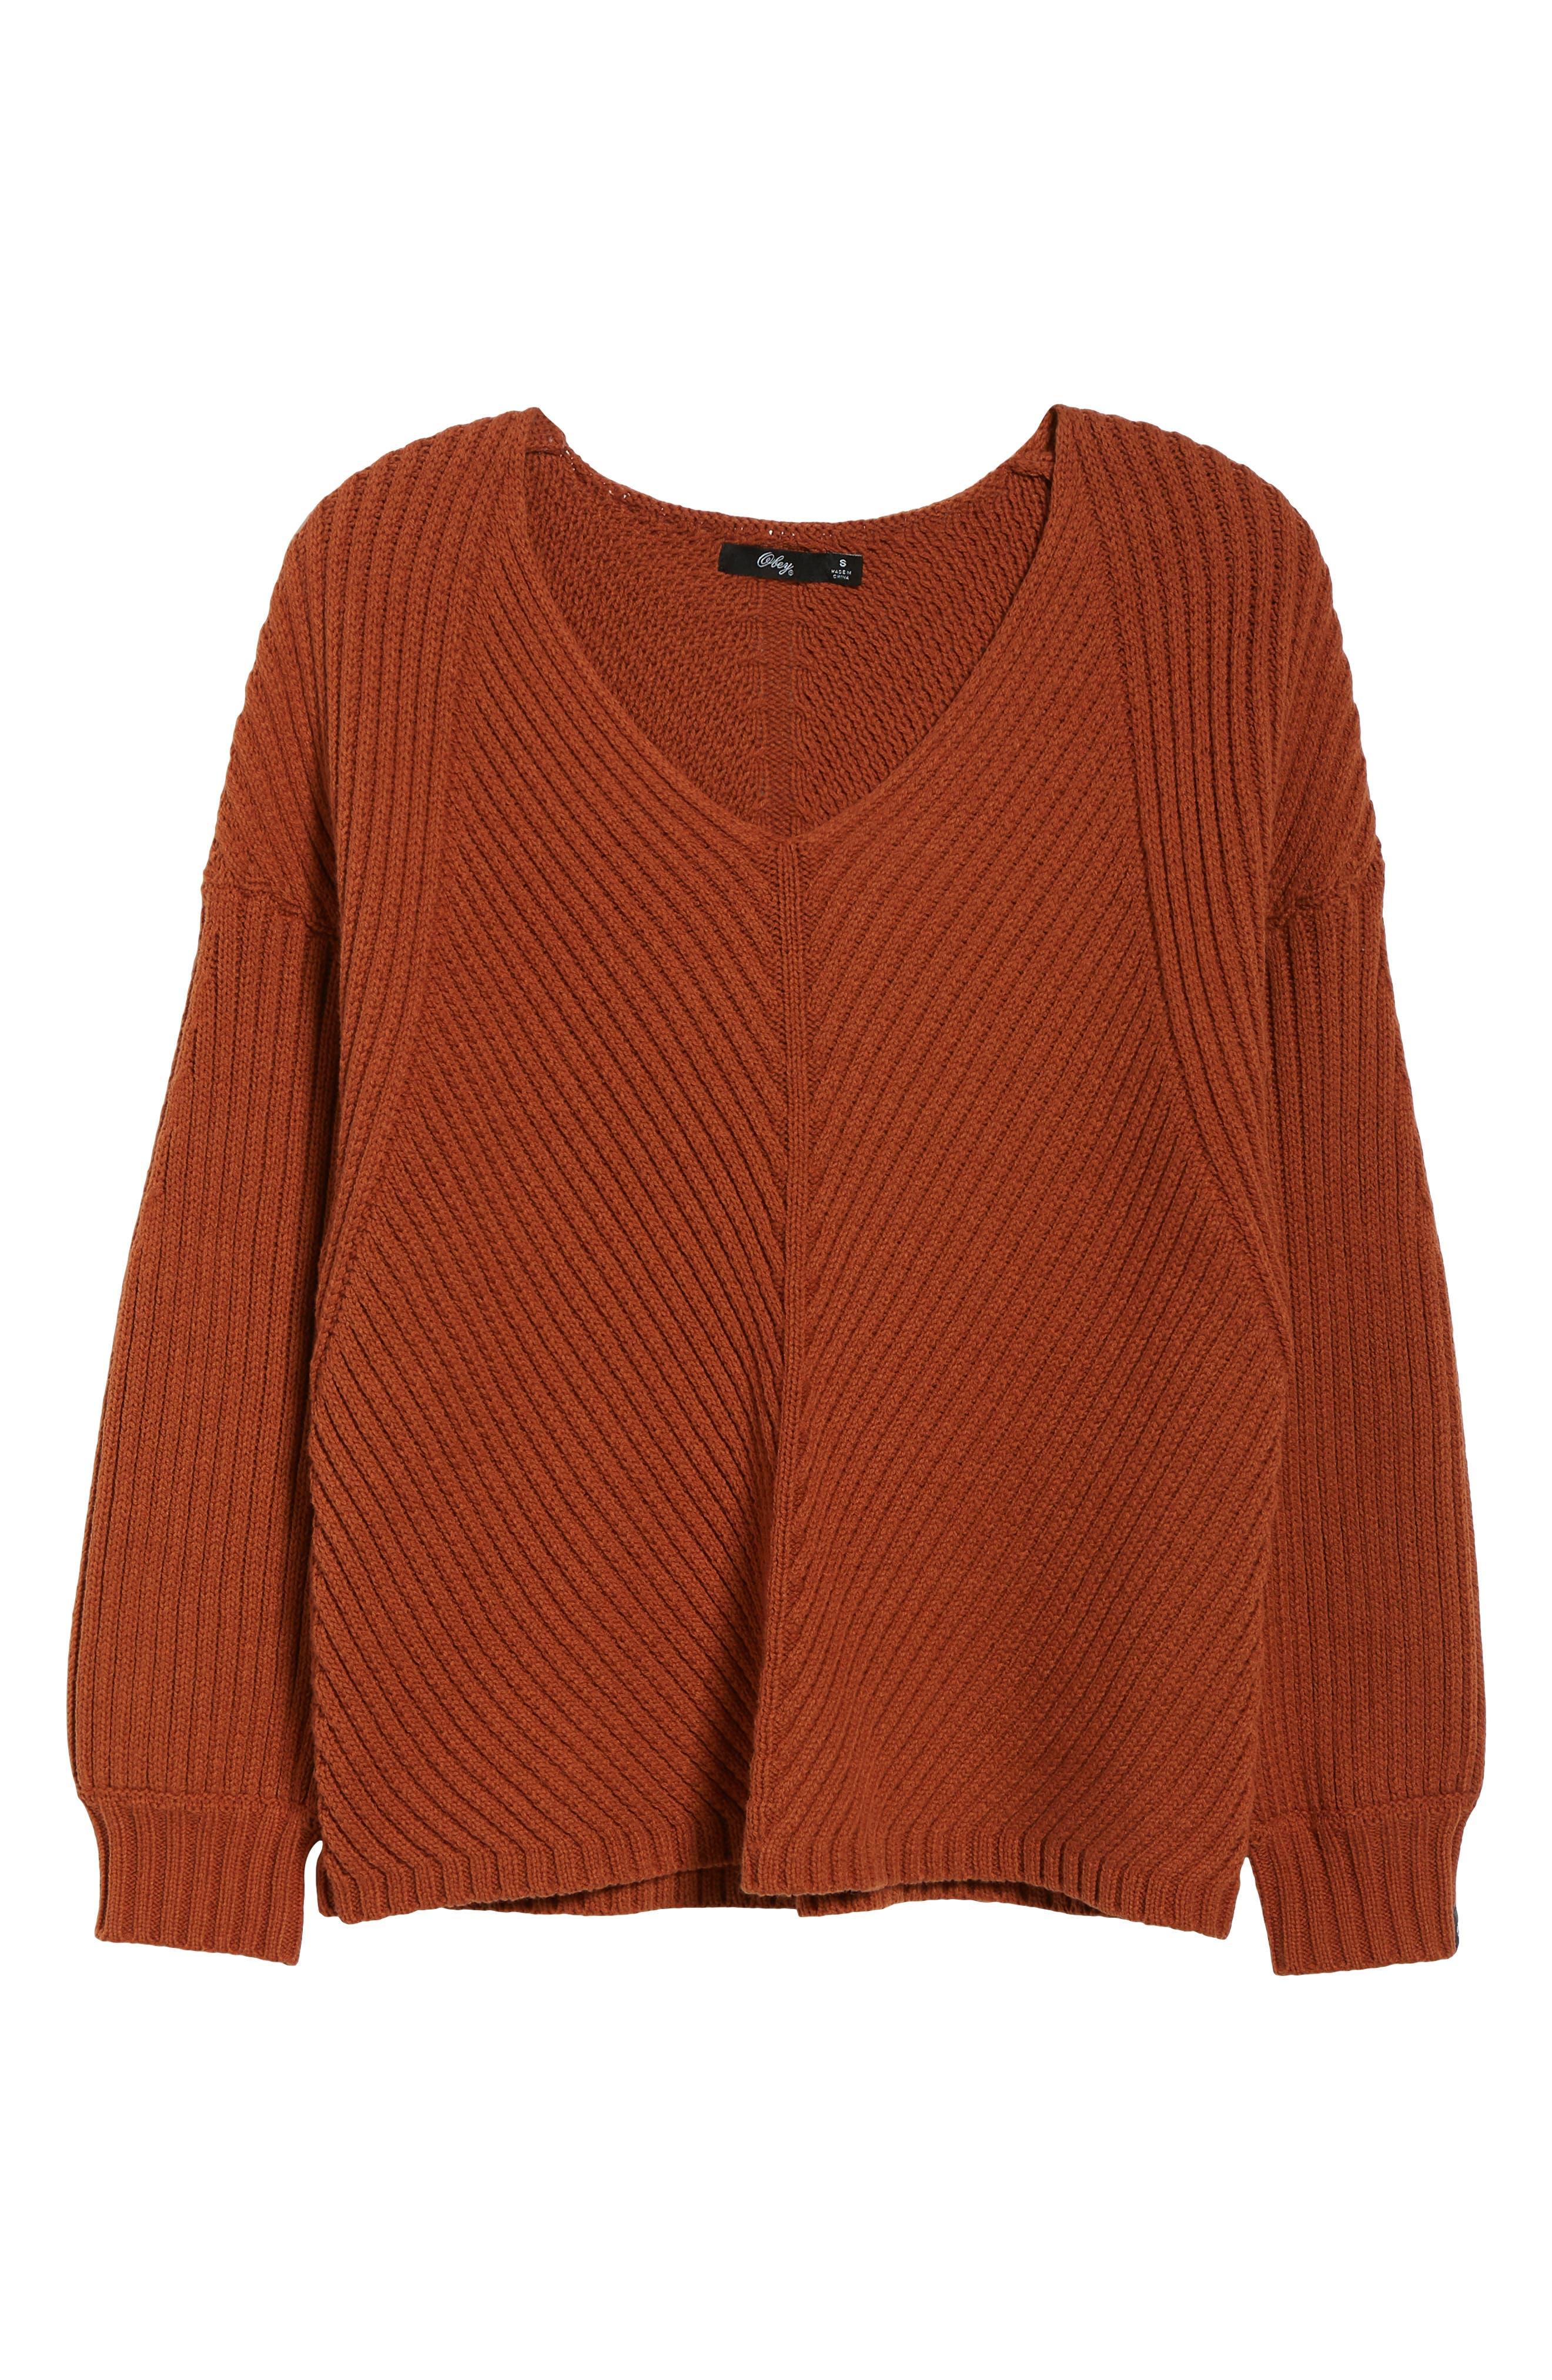 Eleanor Rib Knit Sweater,                             Alternate thumbnail 6, color,                             200